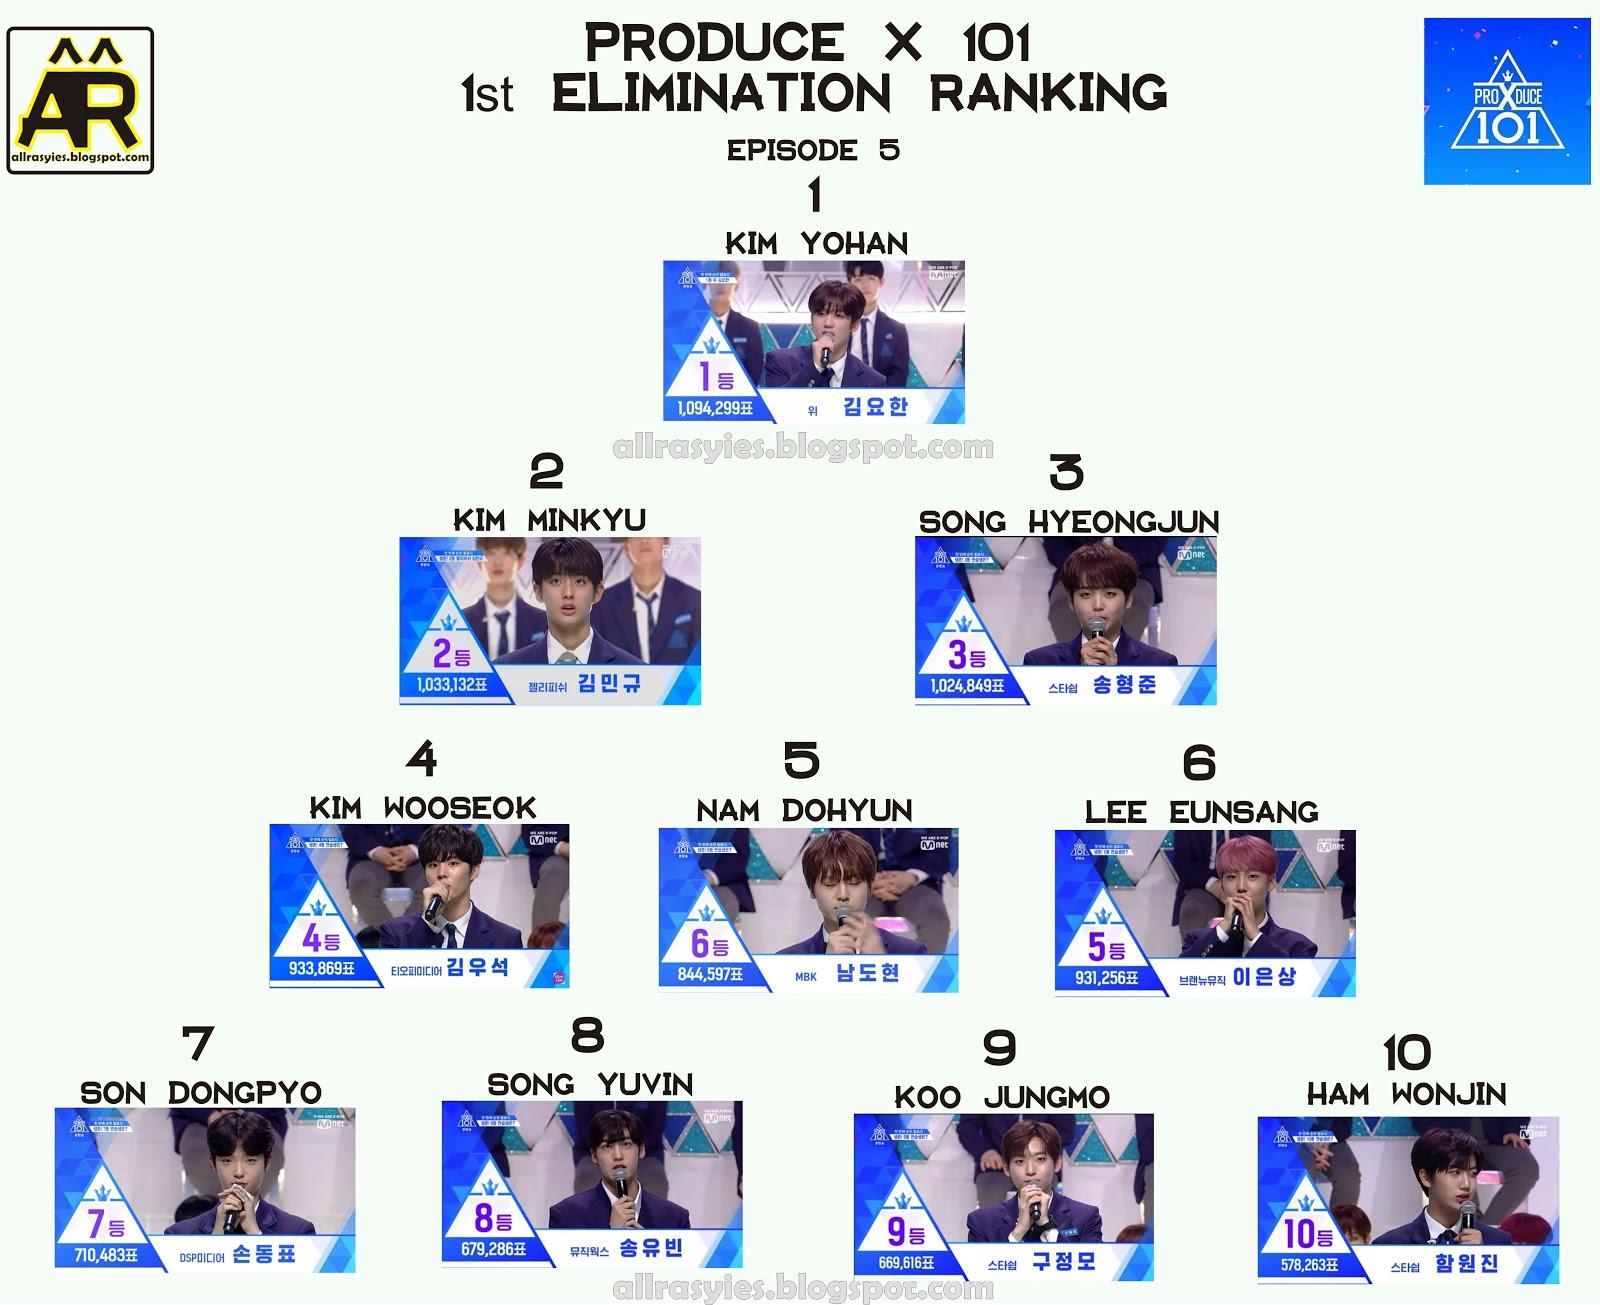 Produce X 101 Ranking All Episode | AllRasyies